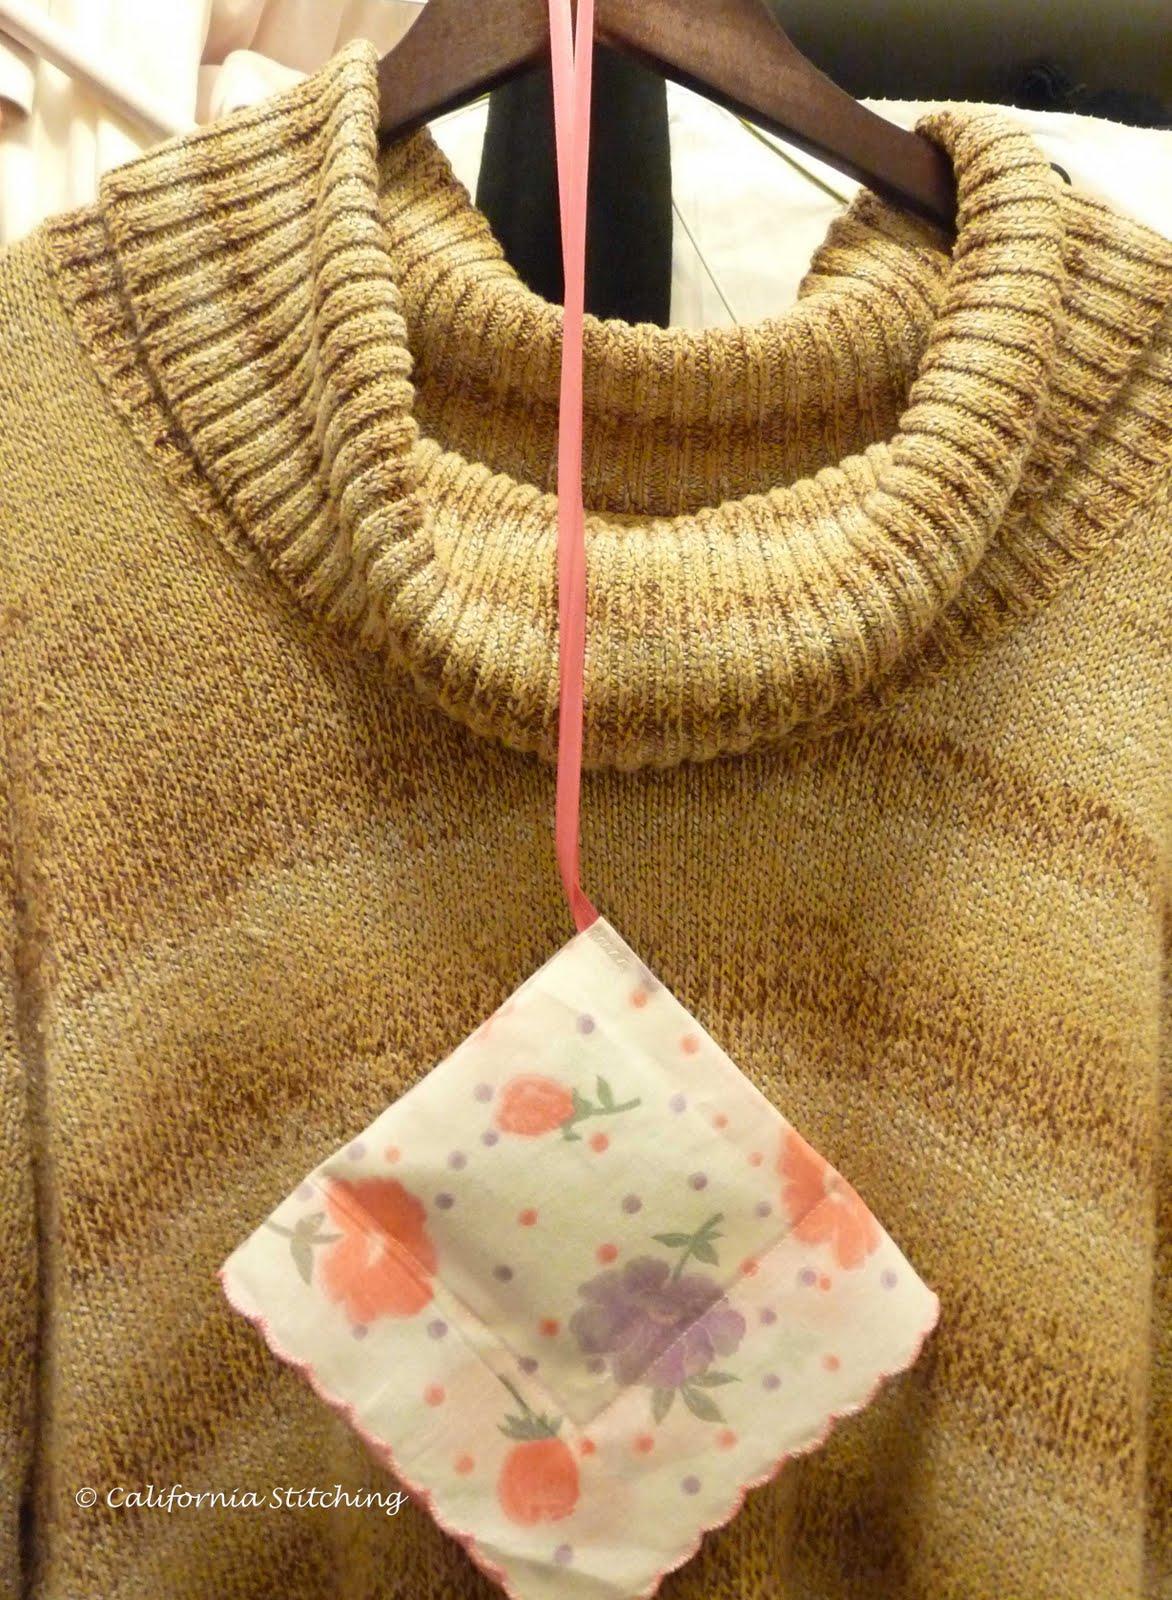 California Stitching: Hanky Lavender Sachets